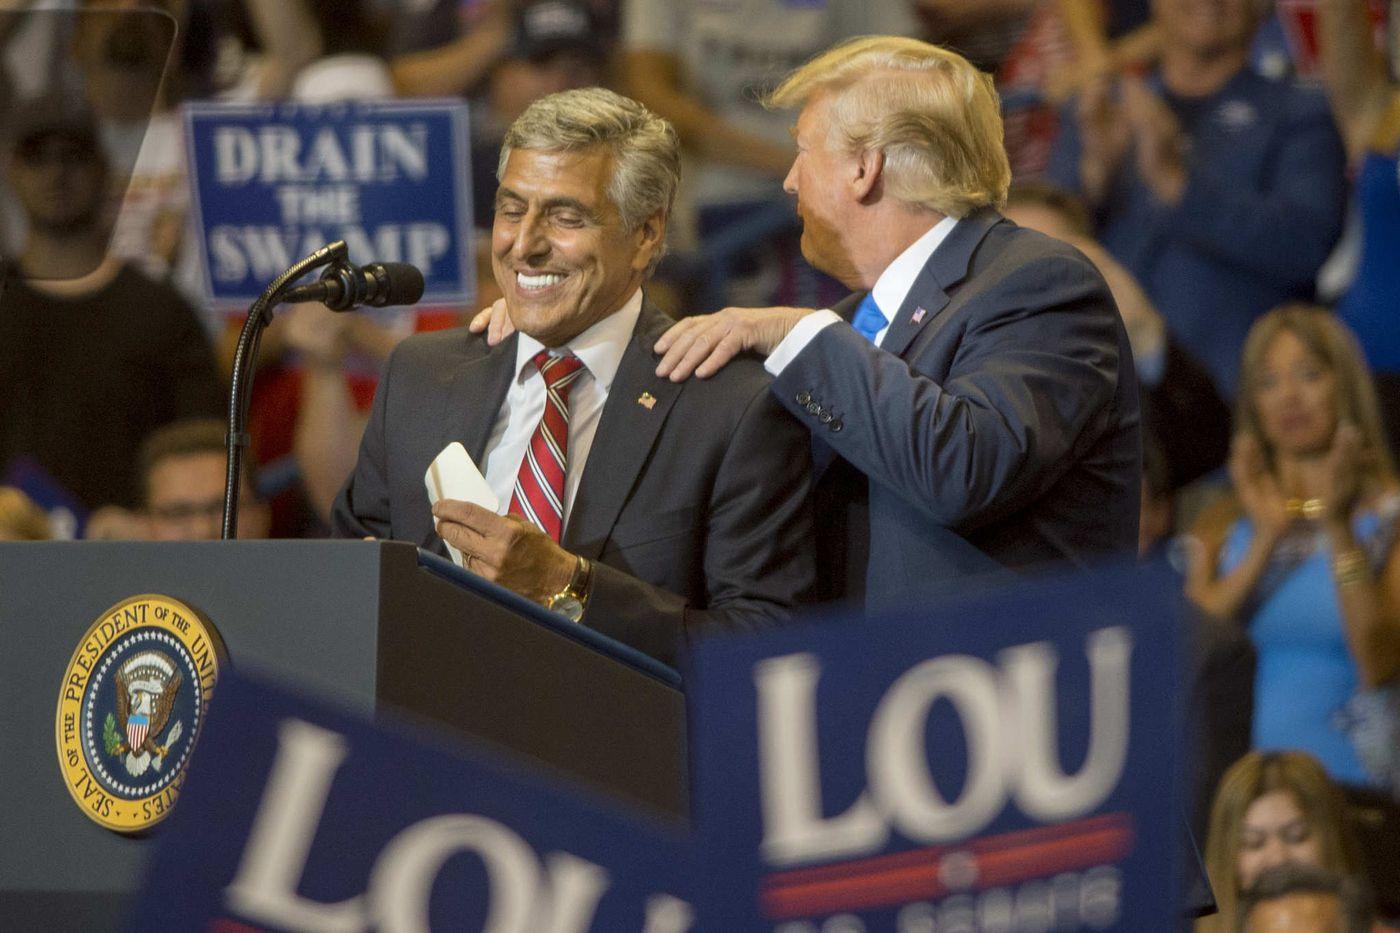 At Luzerne County rally, Trump hits usual themes, knocks 'Sleepin' Bob Casey'